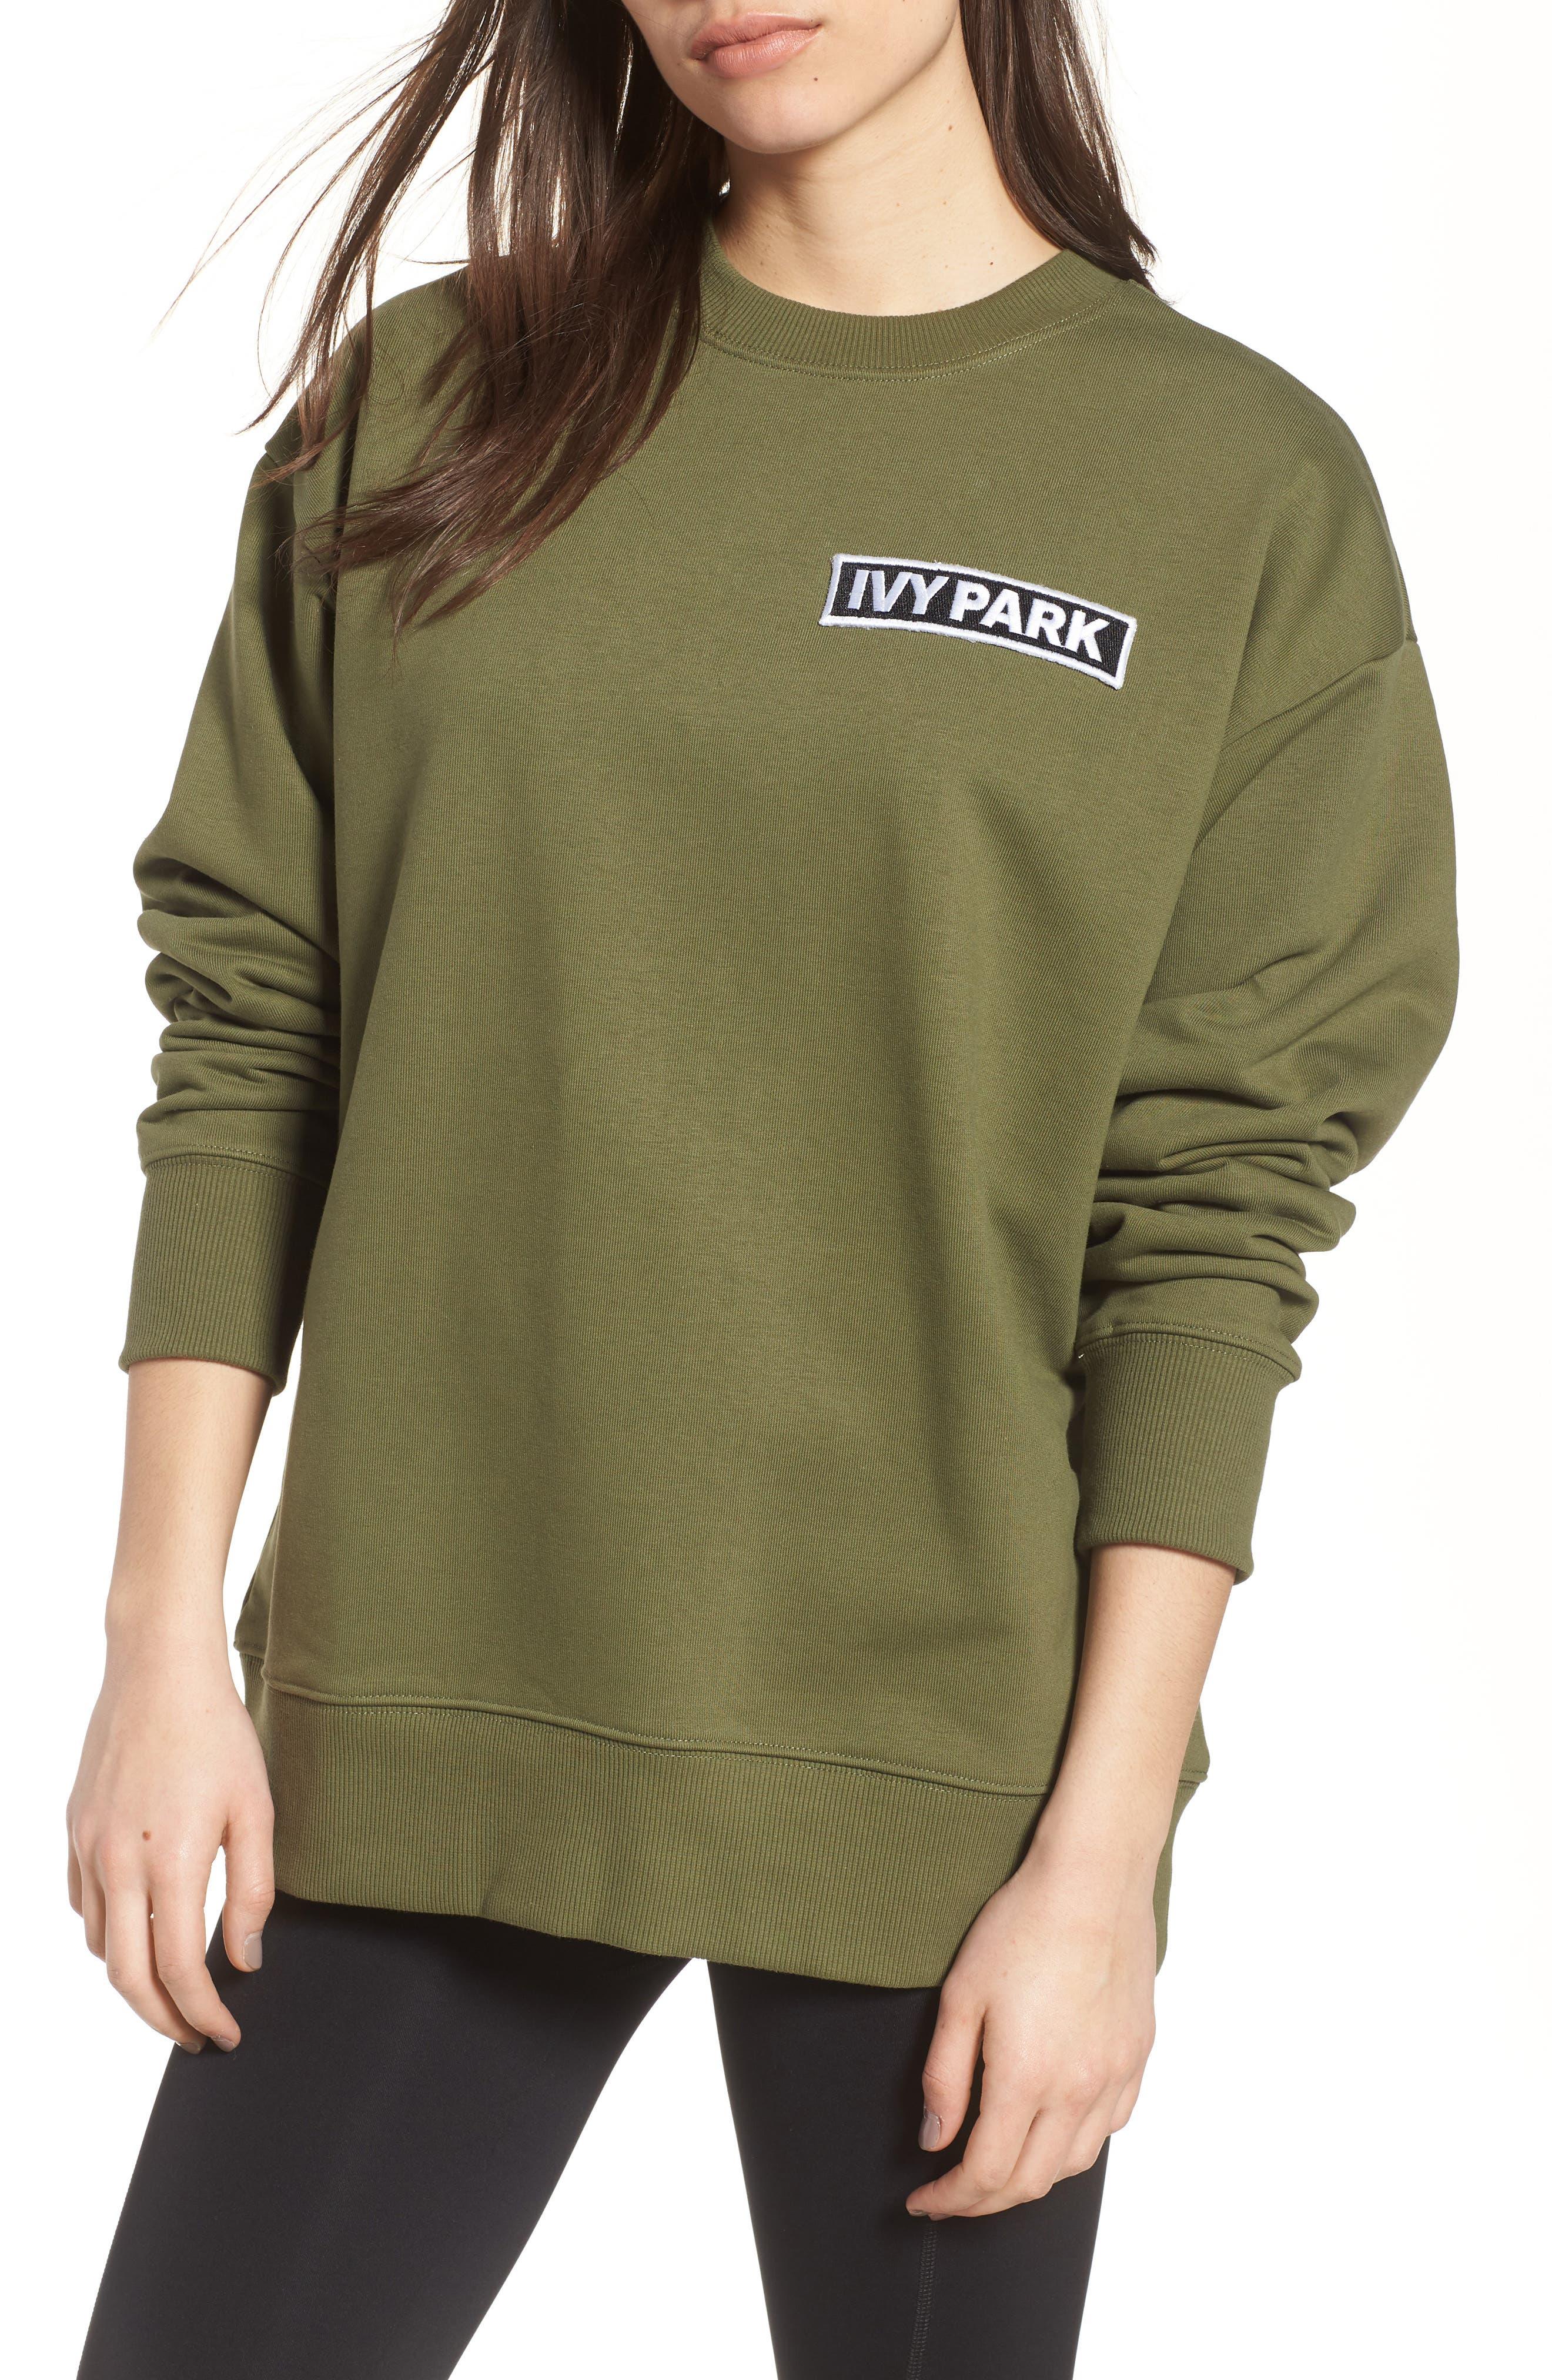 Main Image - IVY PARK® Badge Logo Sweatshirt